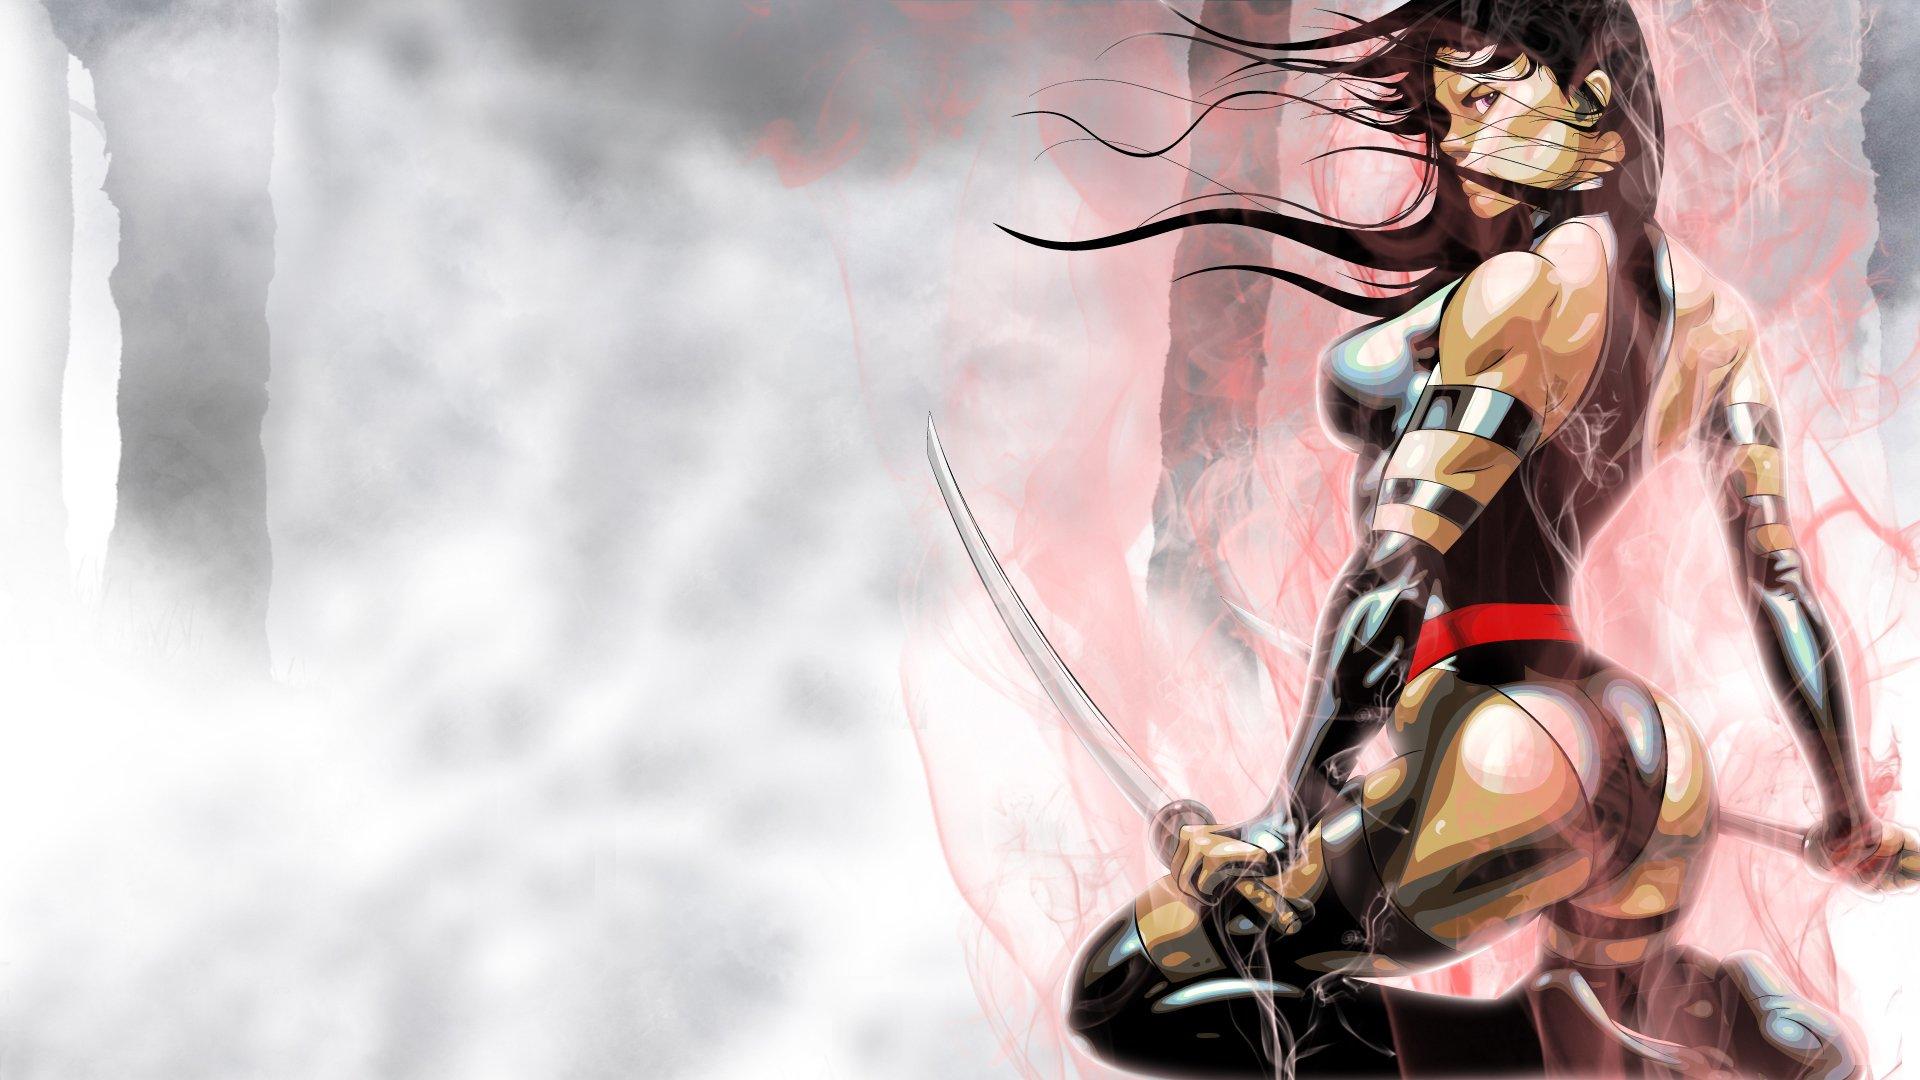 Imagenes De Xmen: PSYLOCKE Marvel Fantasy Warrior Sexy Babe X-men Xmen